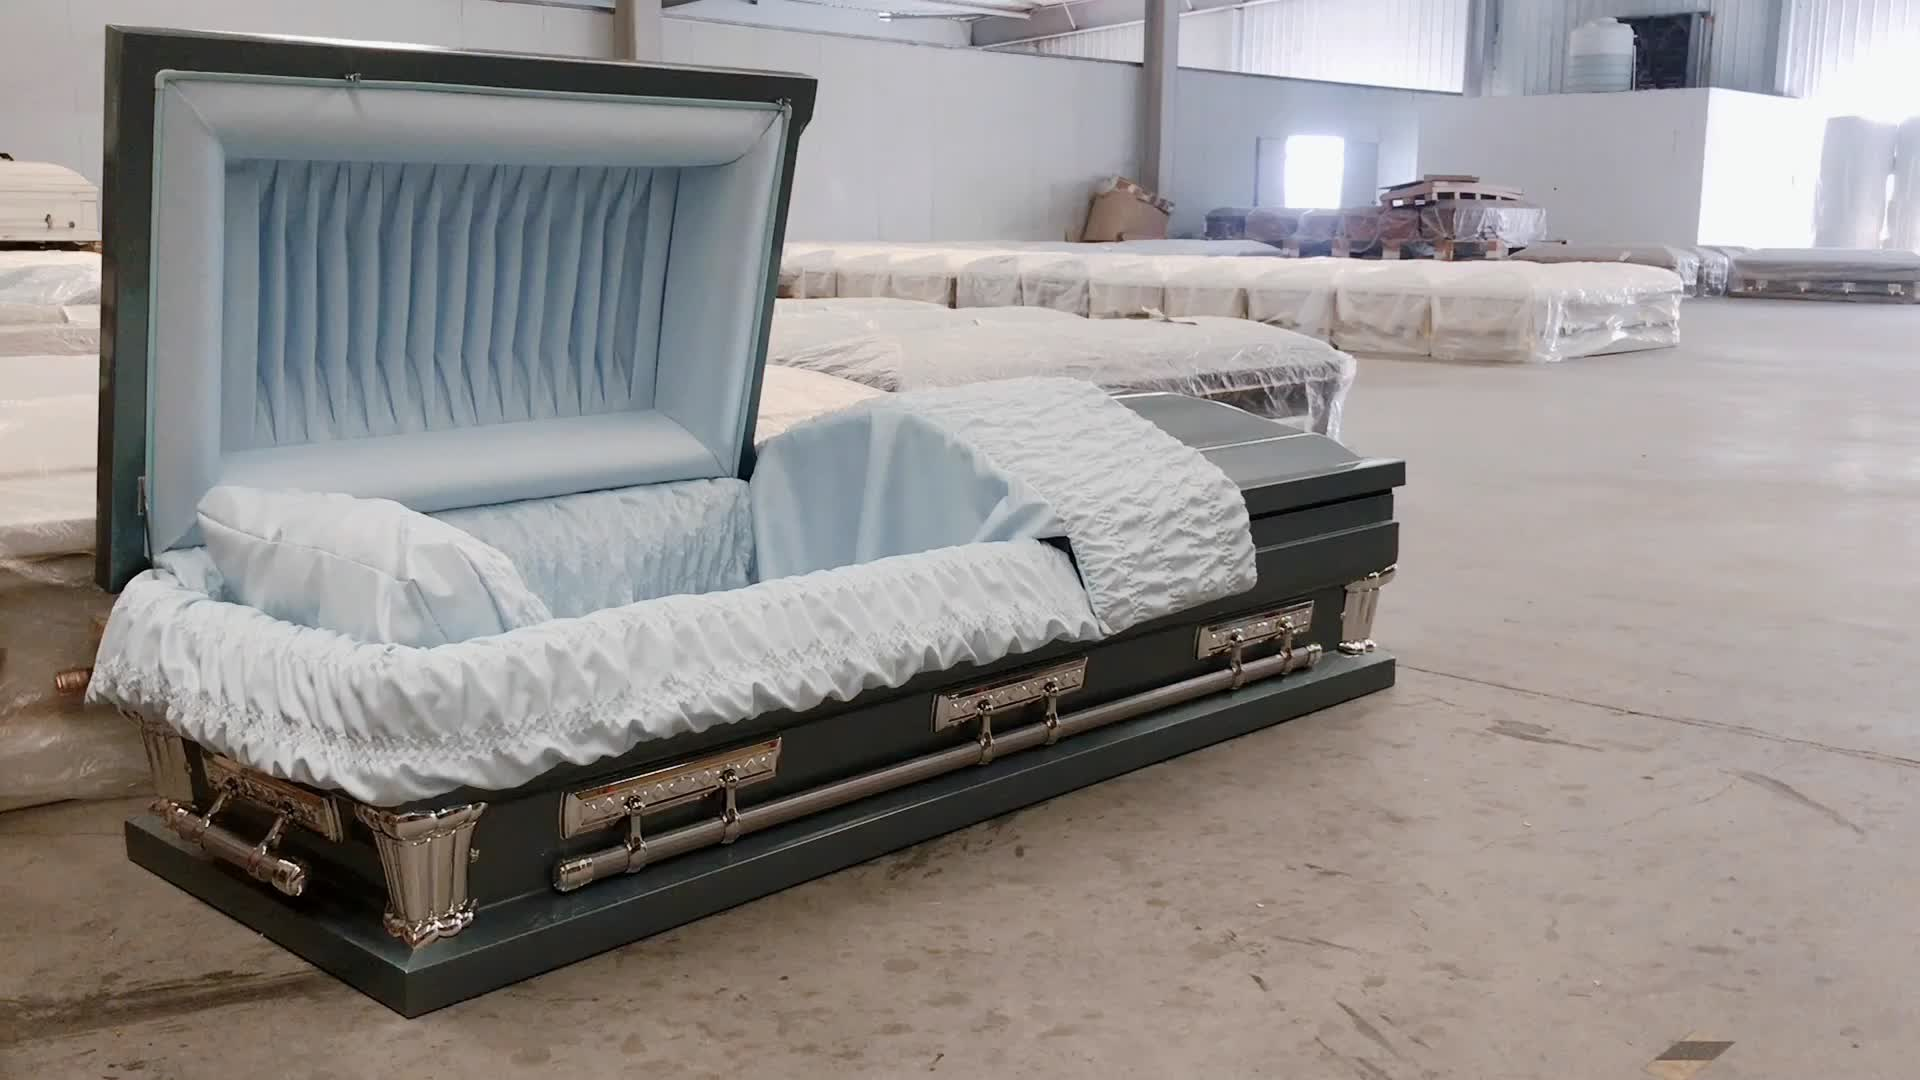 एना गर्म बिक्री बड़ा आकार अमेरिका शैली 18 गा स्टील अंतिम संस्कार आपूर्ति ताबूत डिबिया